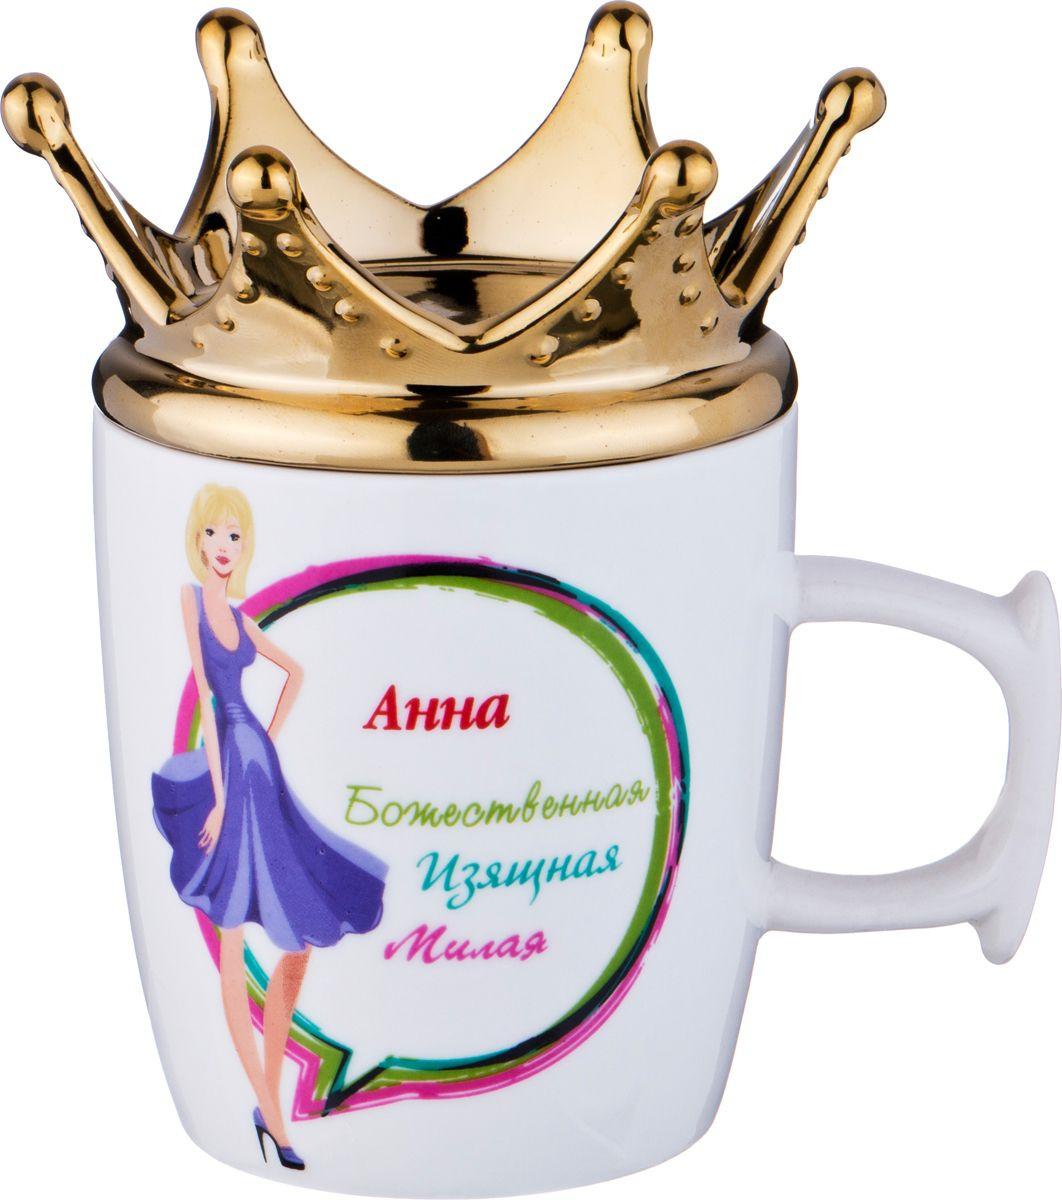 Кружка столовая Lefard Анна-королева, 383-677, мультиколор, 300 мл цены онлайн